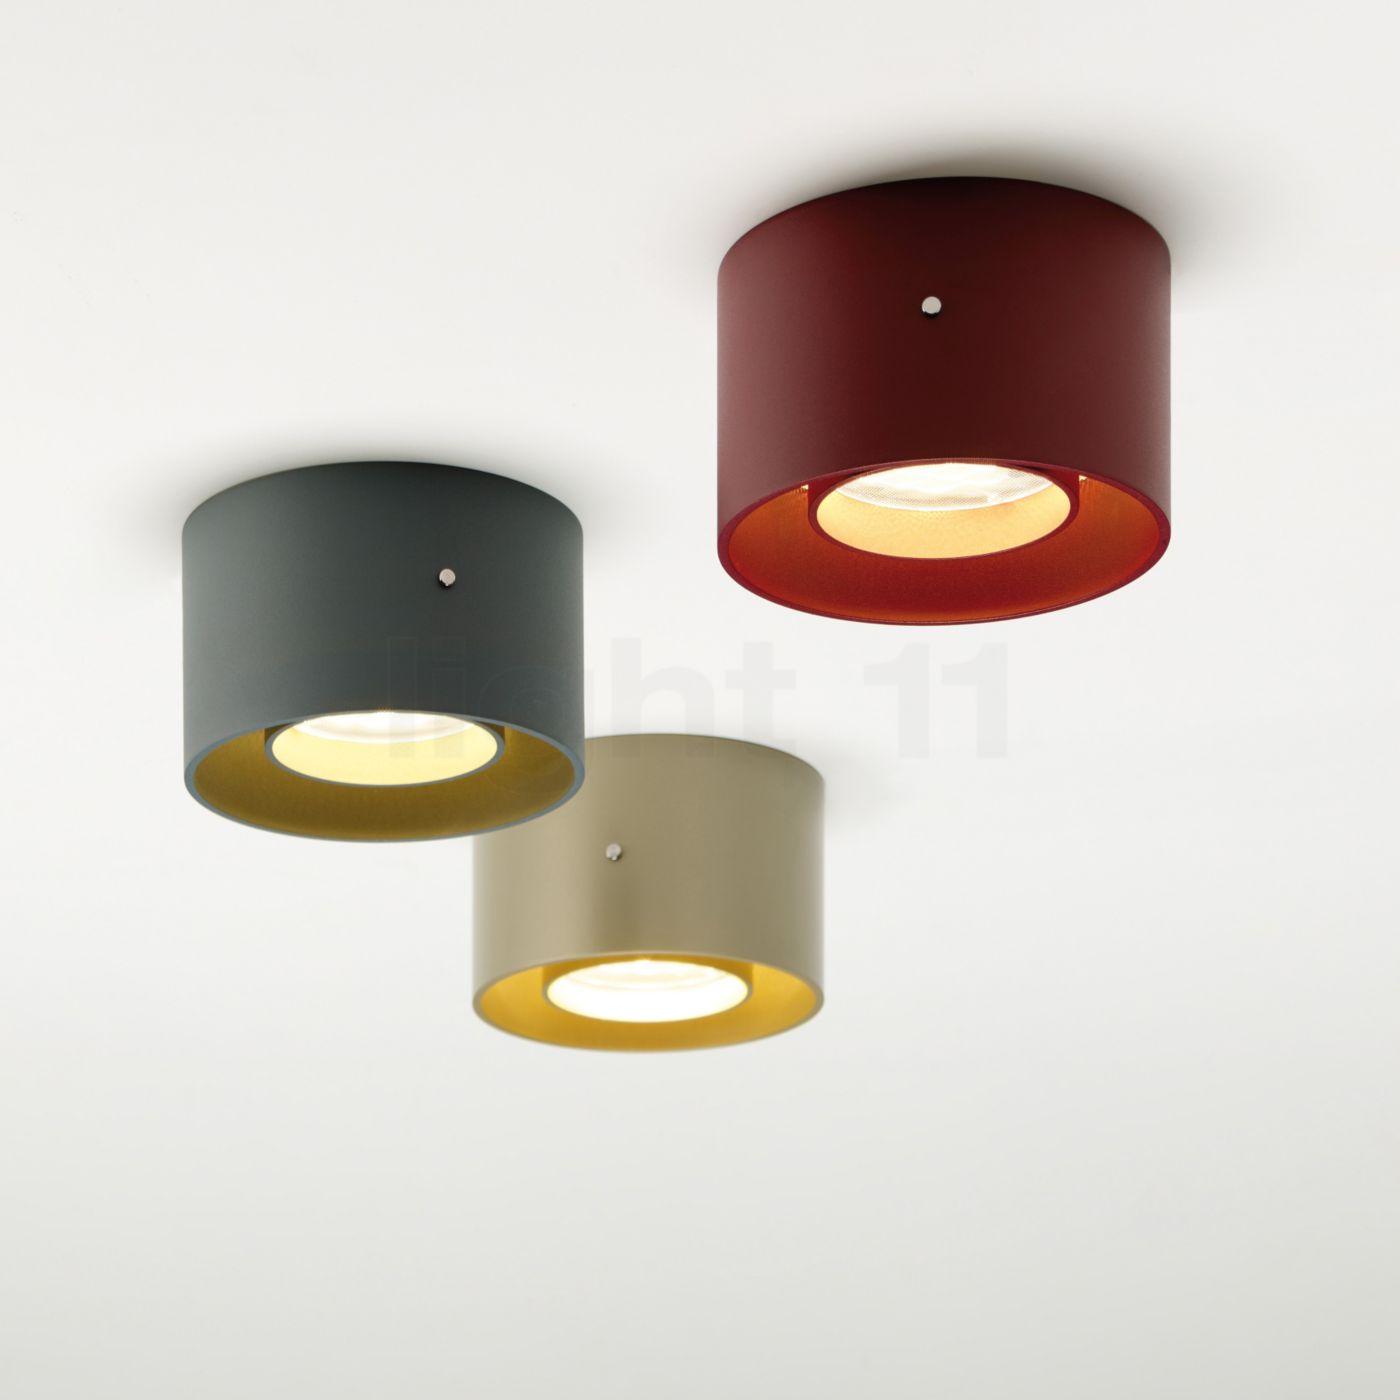 Oligo Trofeo Plafondlamp LED kopen bij light11.nl